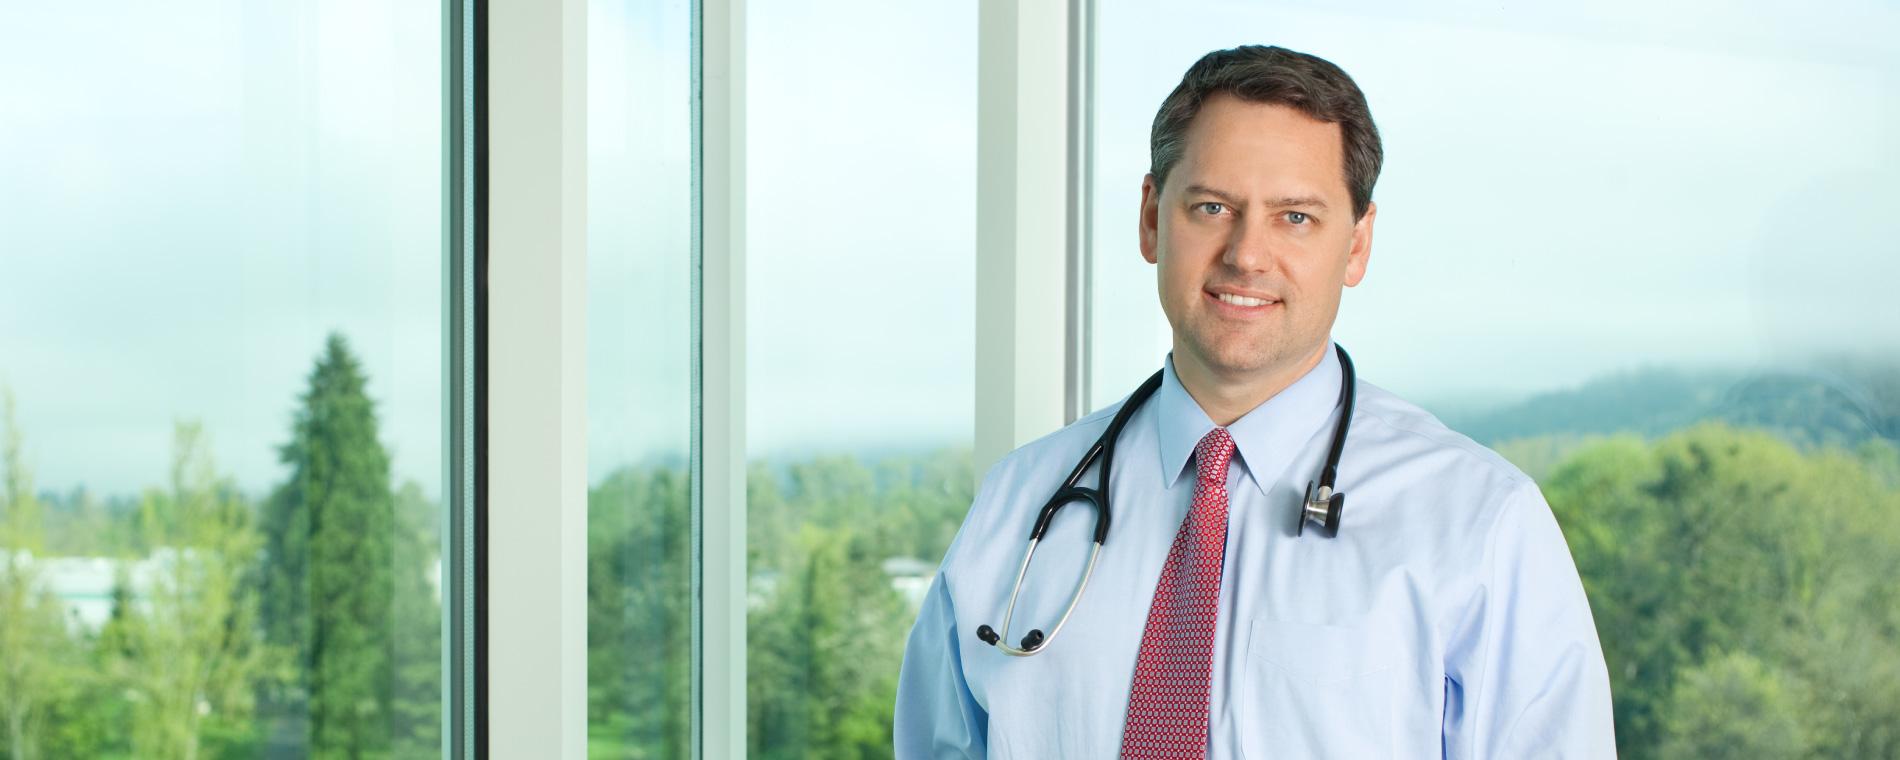 Jeff Sharman, MD